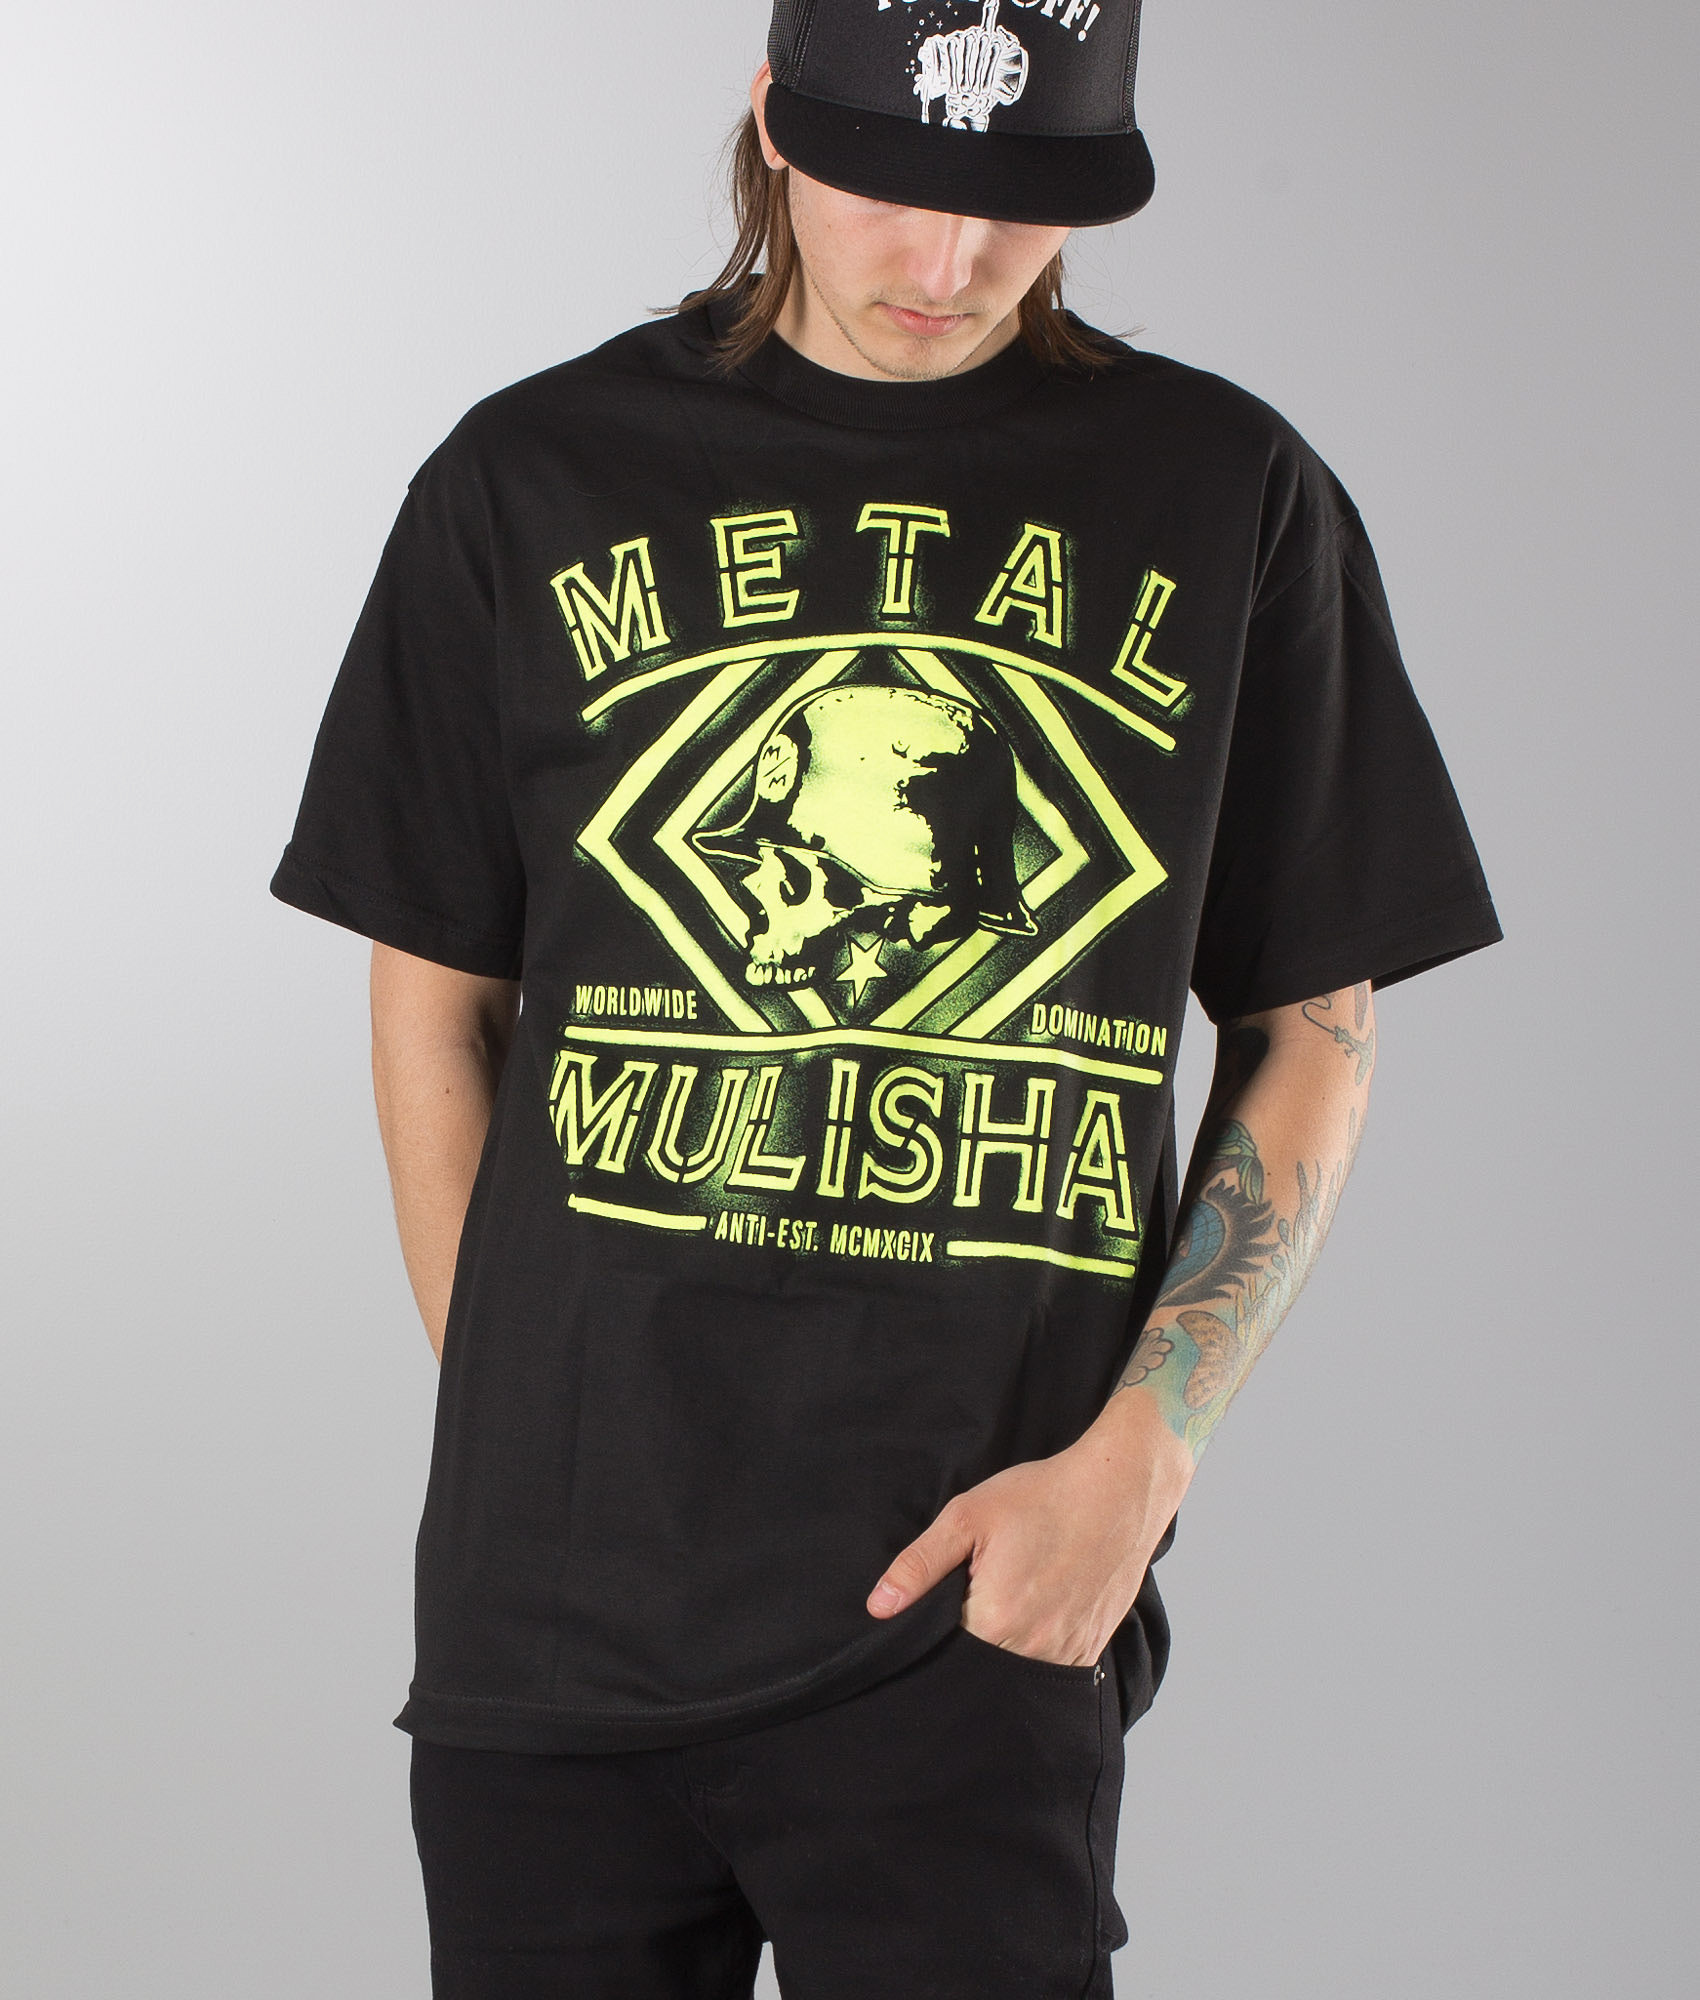 Metal Mulisha T Shirts Womens - DREAMWORKS